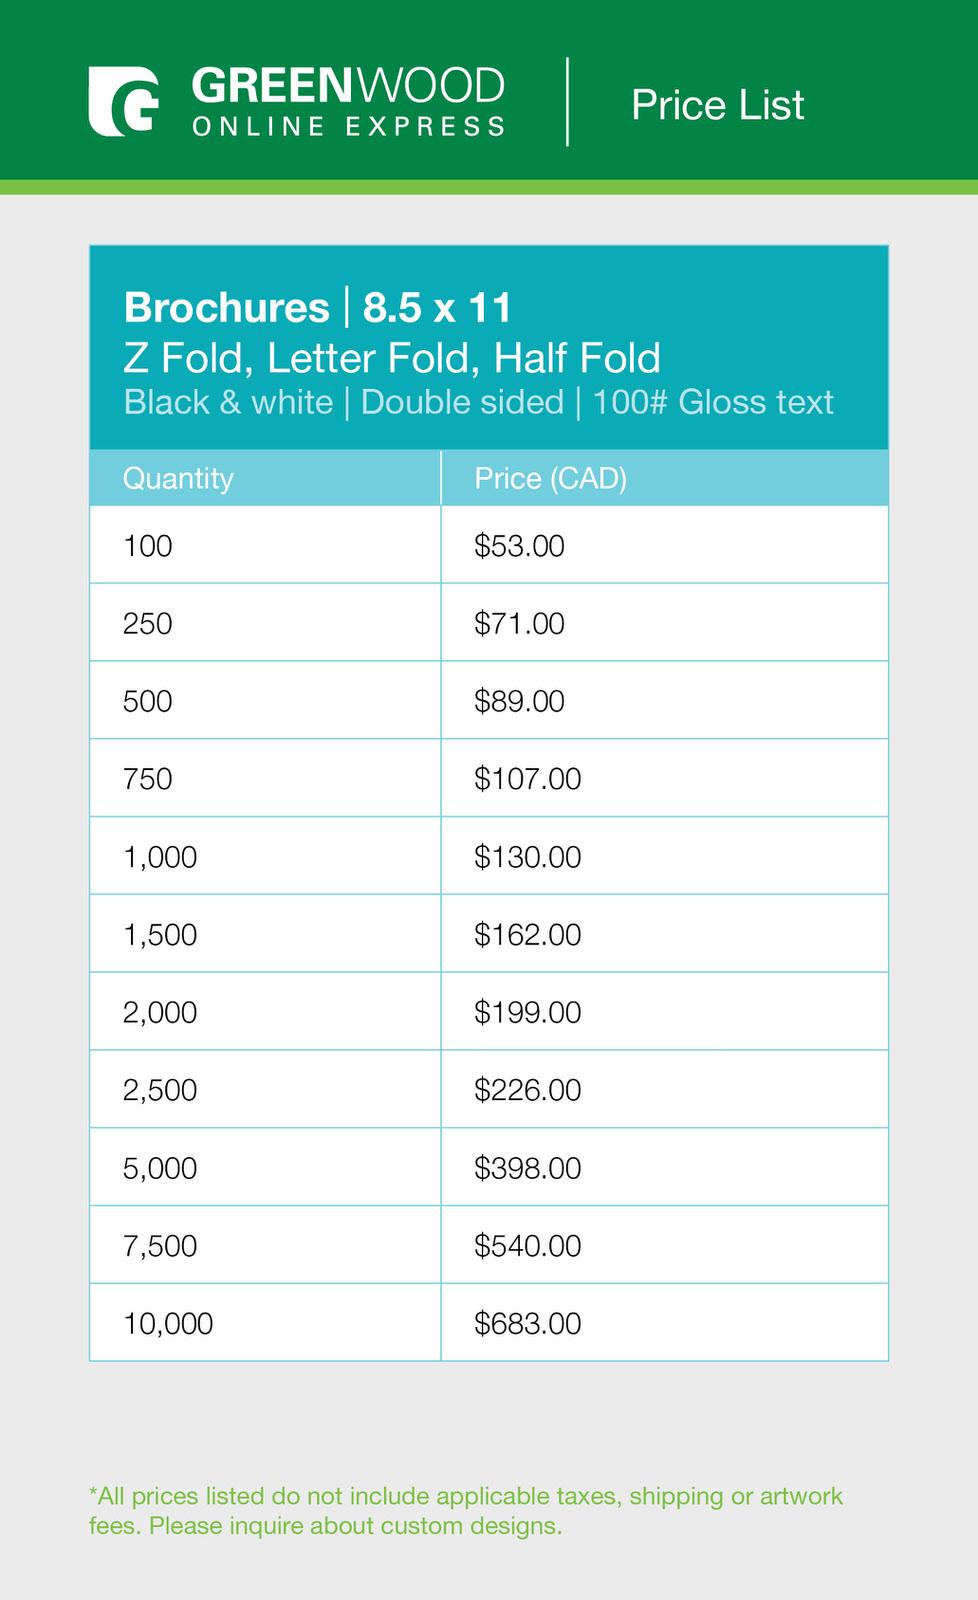 Greenwood brochure bw price list.jpg